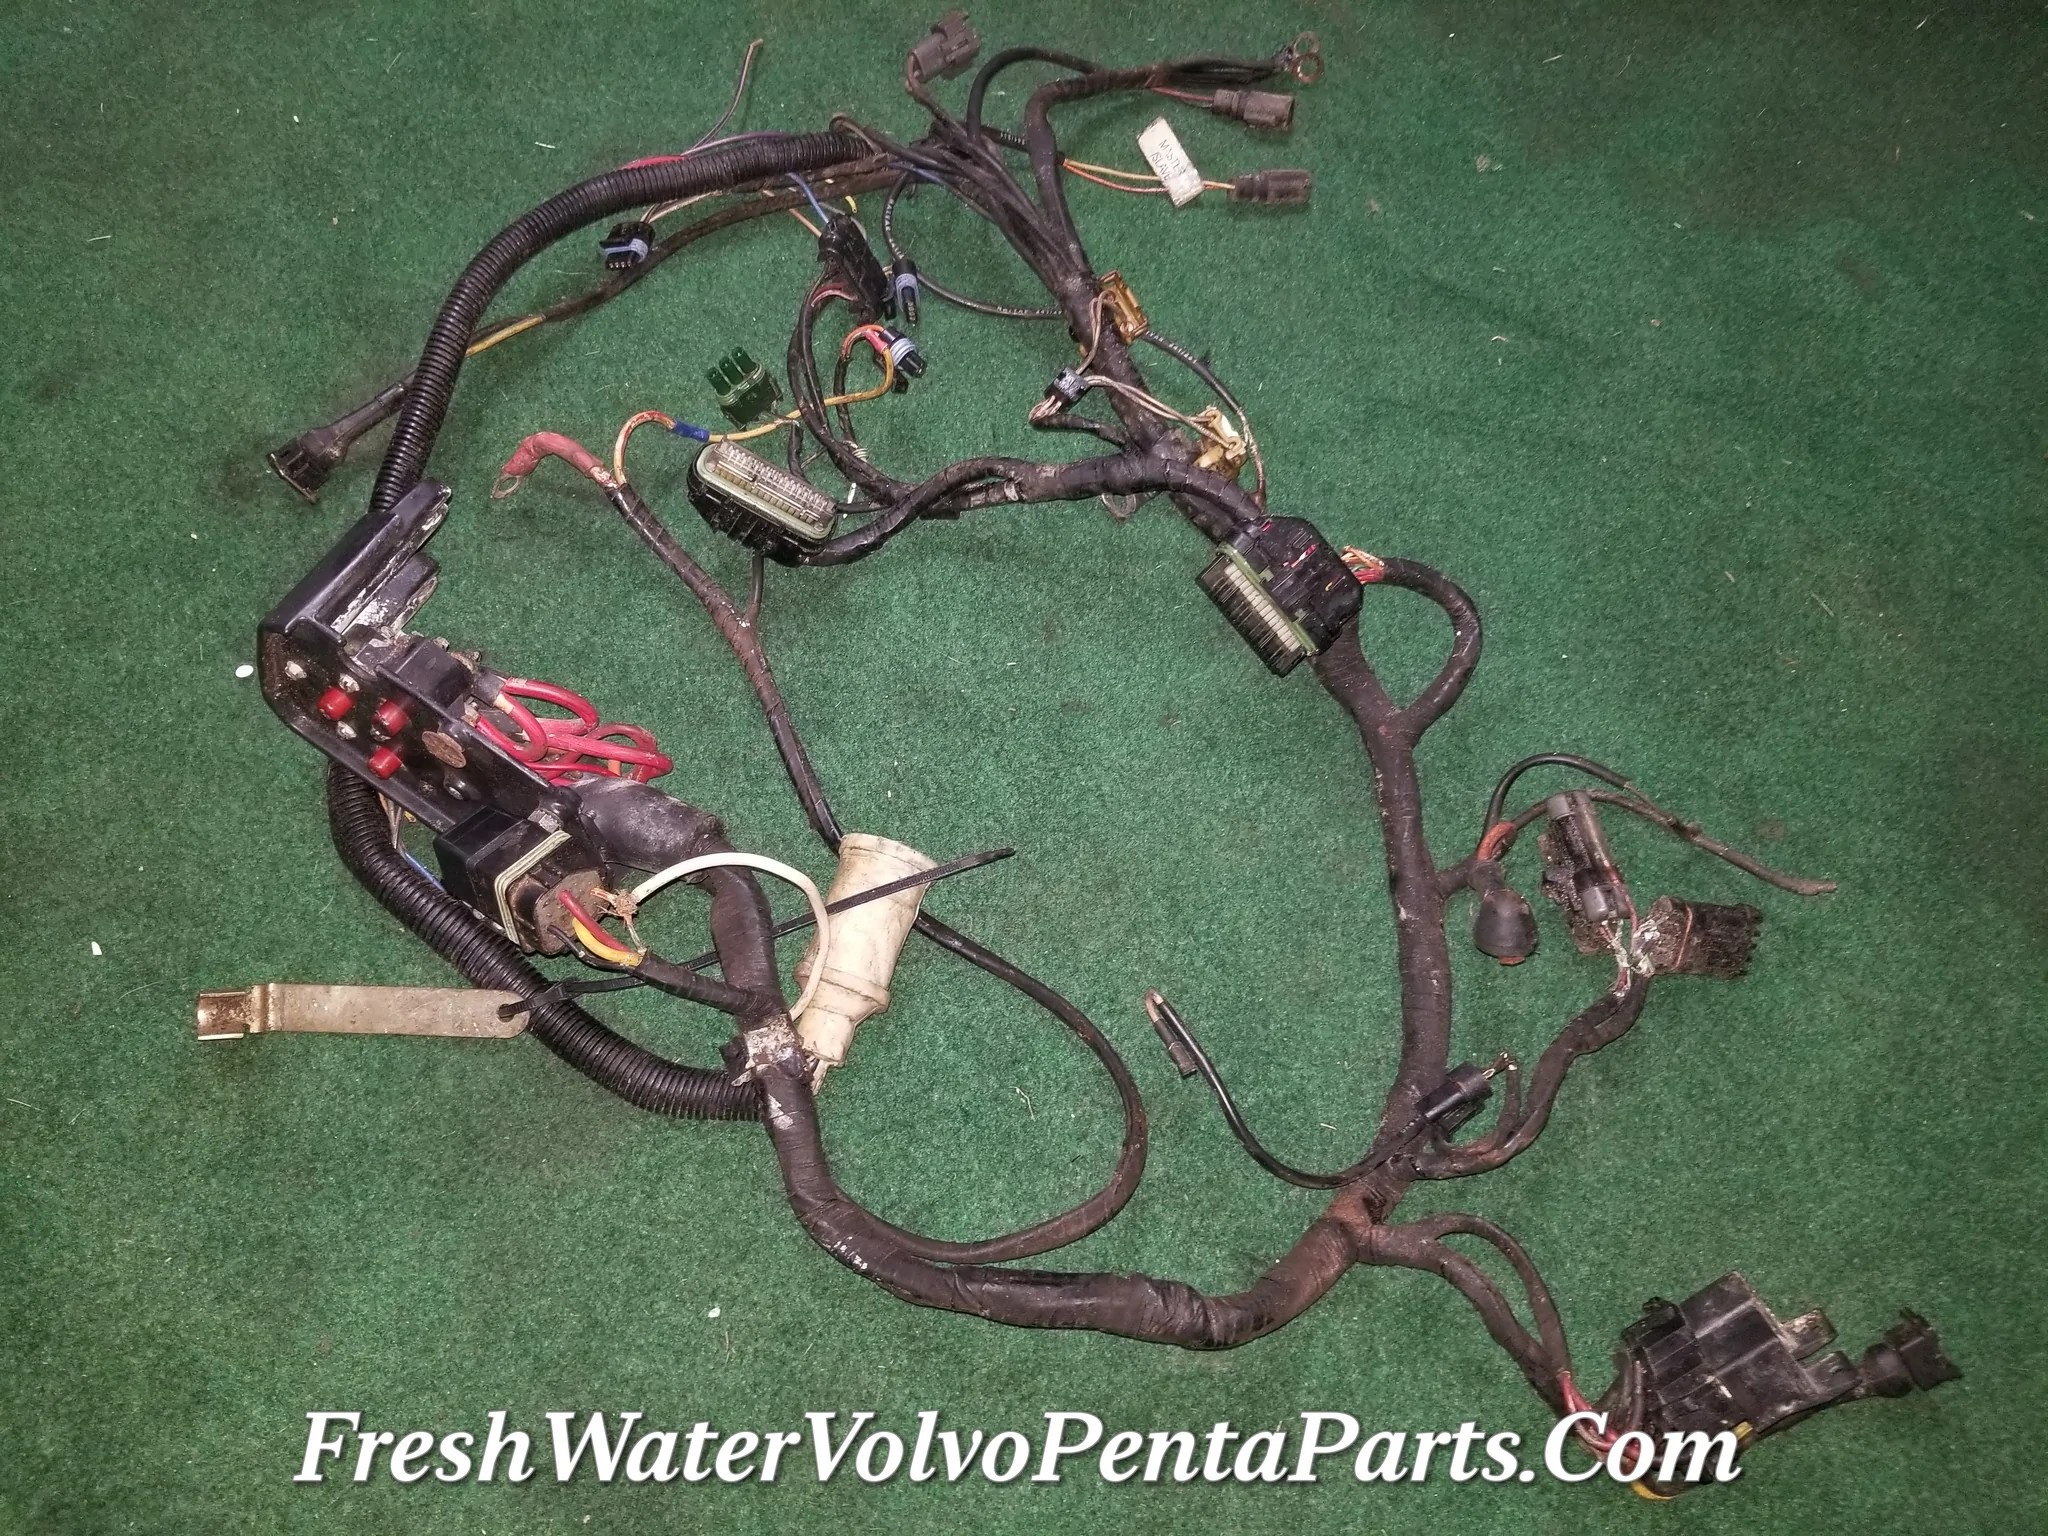 medium resolution of volvo penta 1995 tbi 5 7gi wiring harness 5 7l 5 0l v8 p n 3850364 freshwatervolvopentaparts com